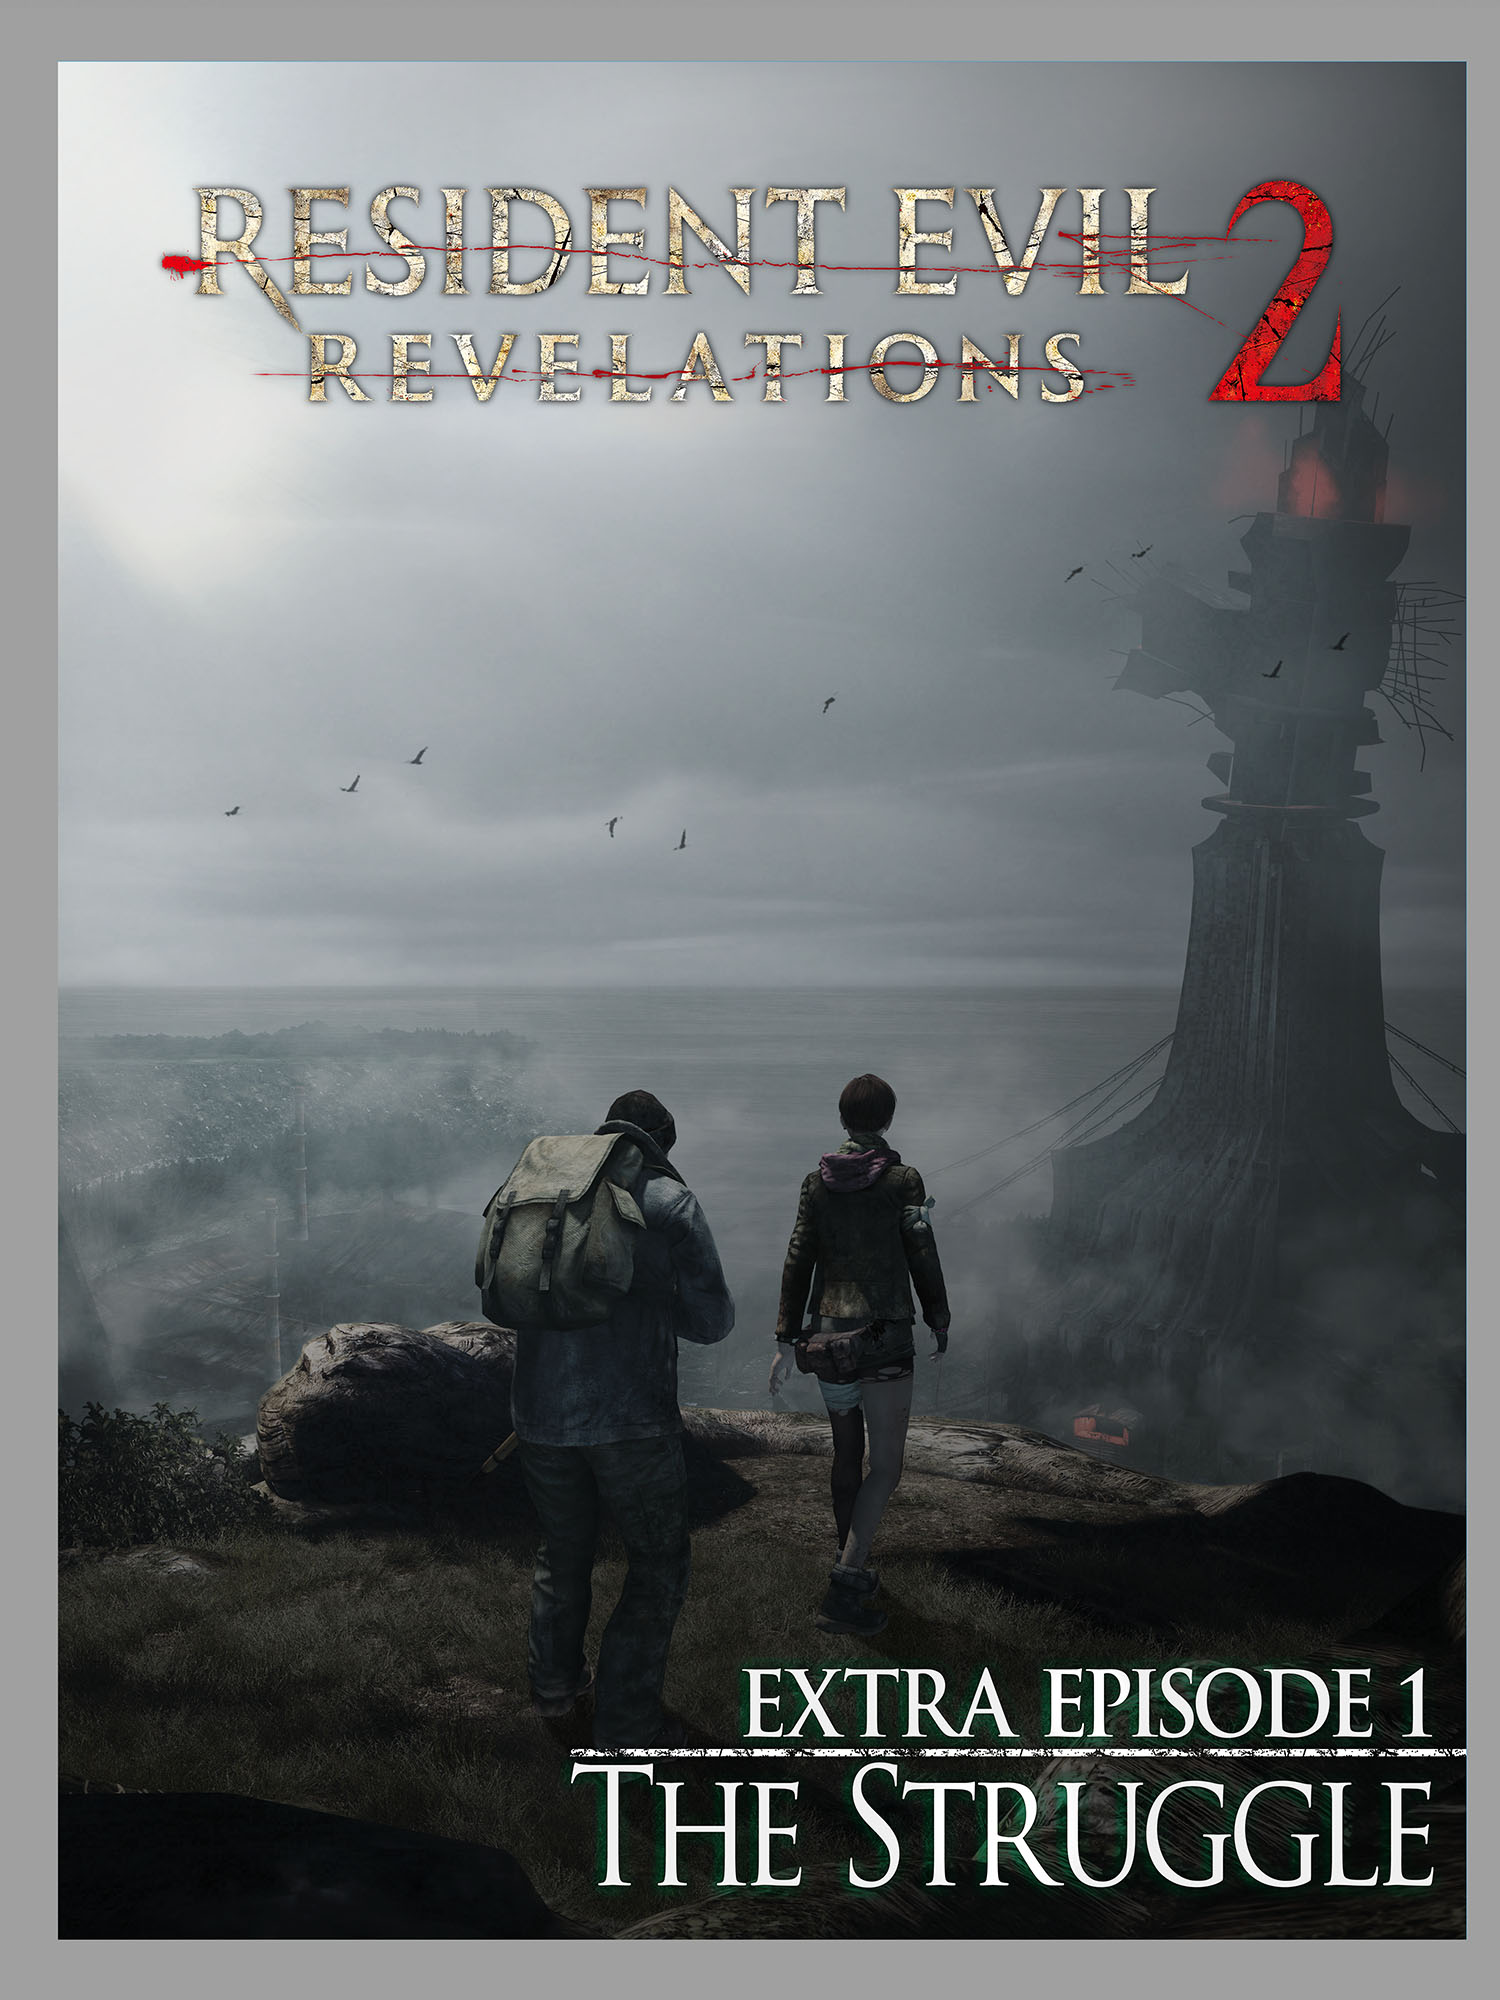 Extra Episode 1